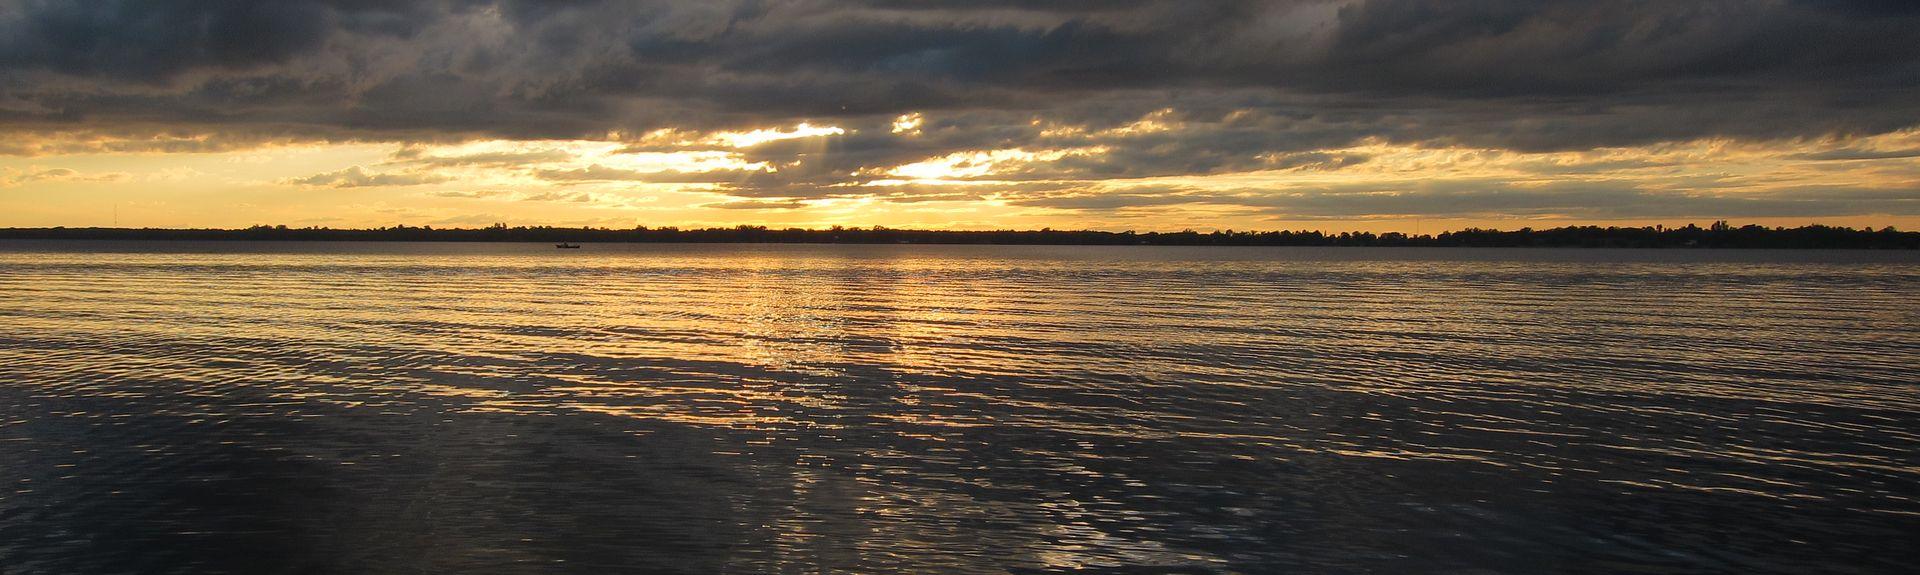 Lake Ontario Park, Kingston, Ontario, Canada